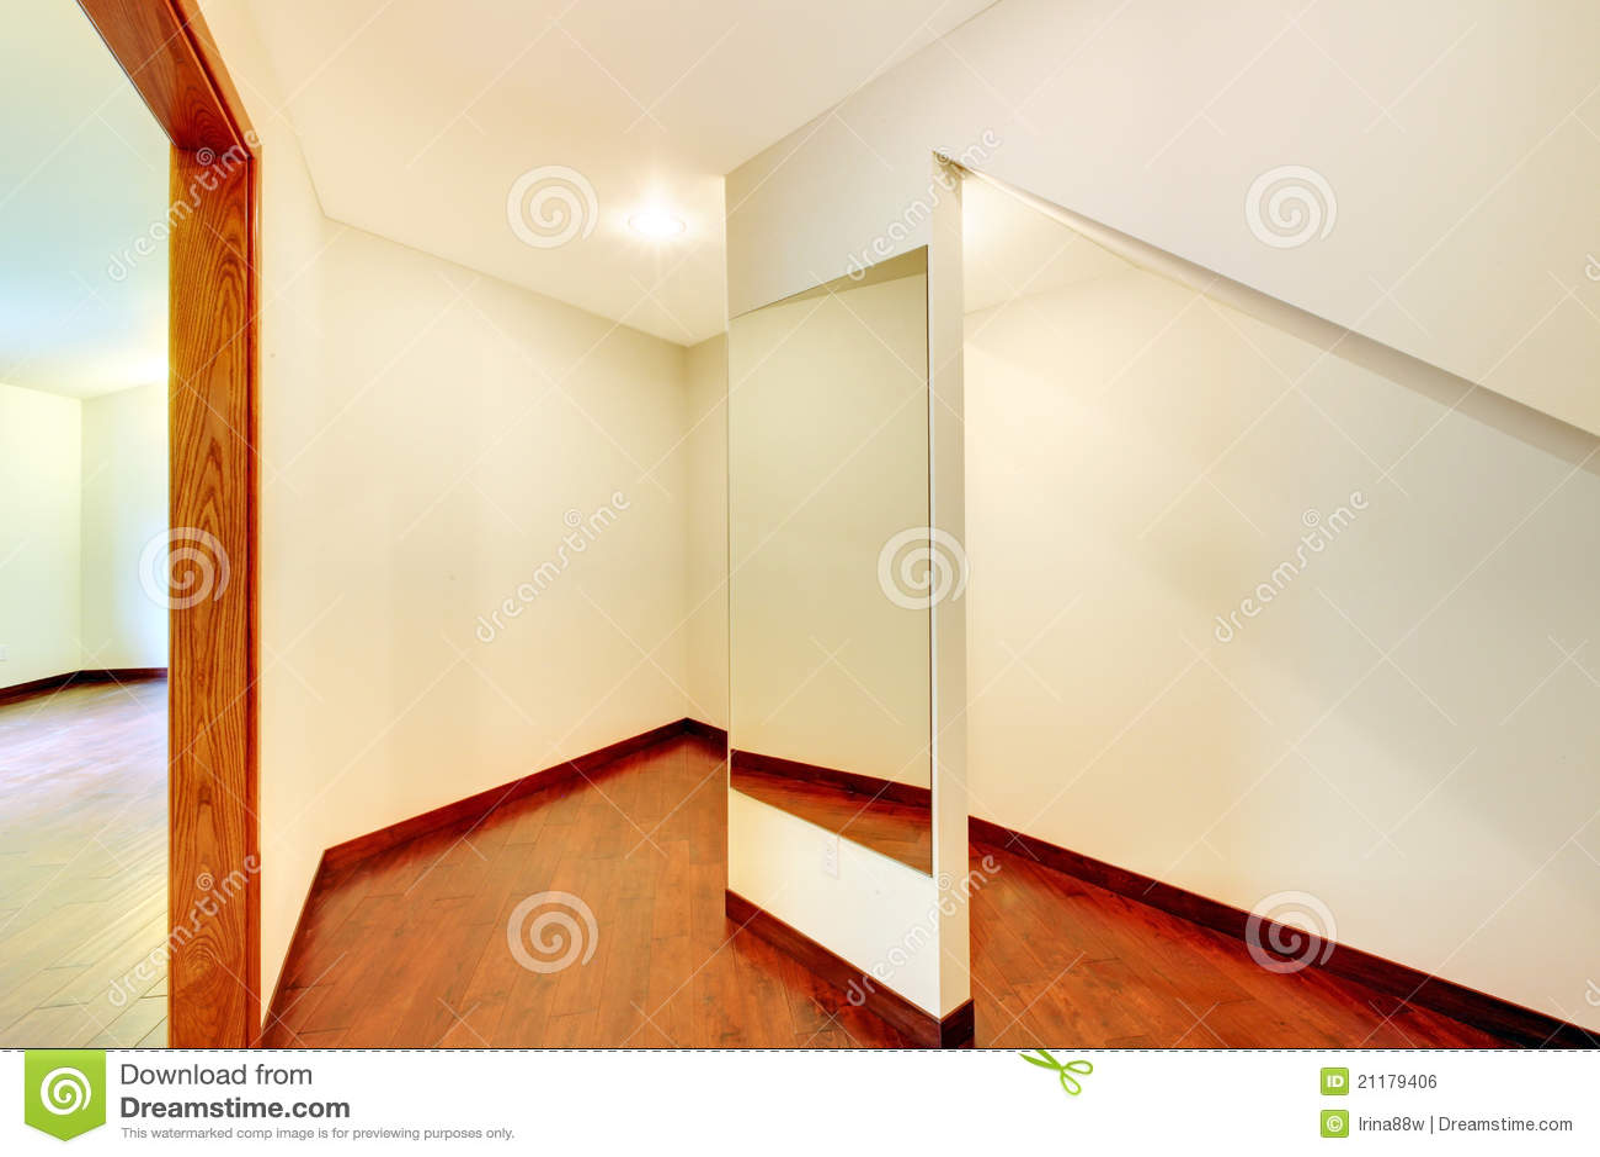 Landry room with maple custom build cabinets